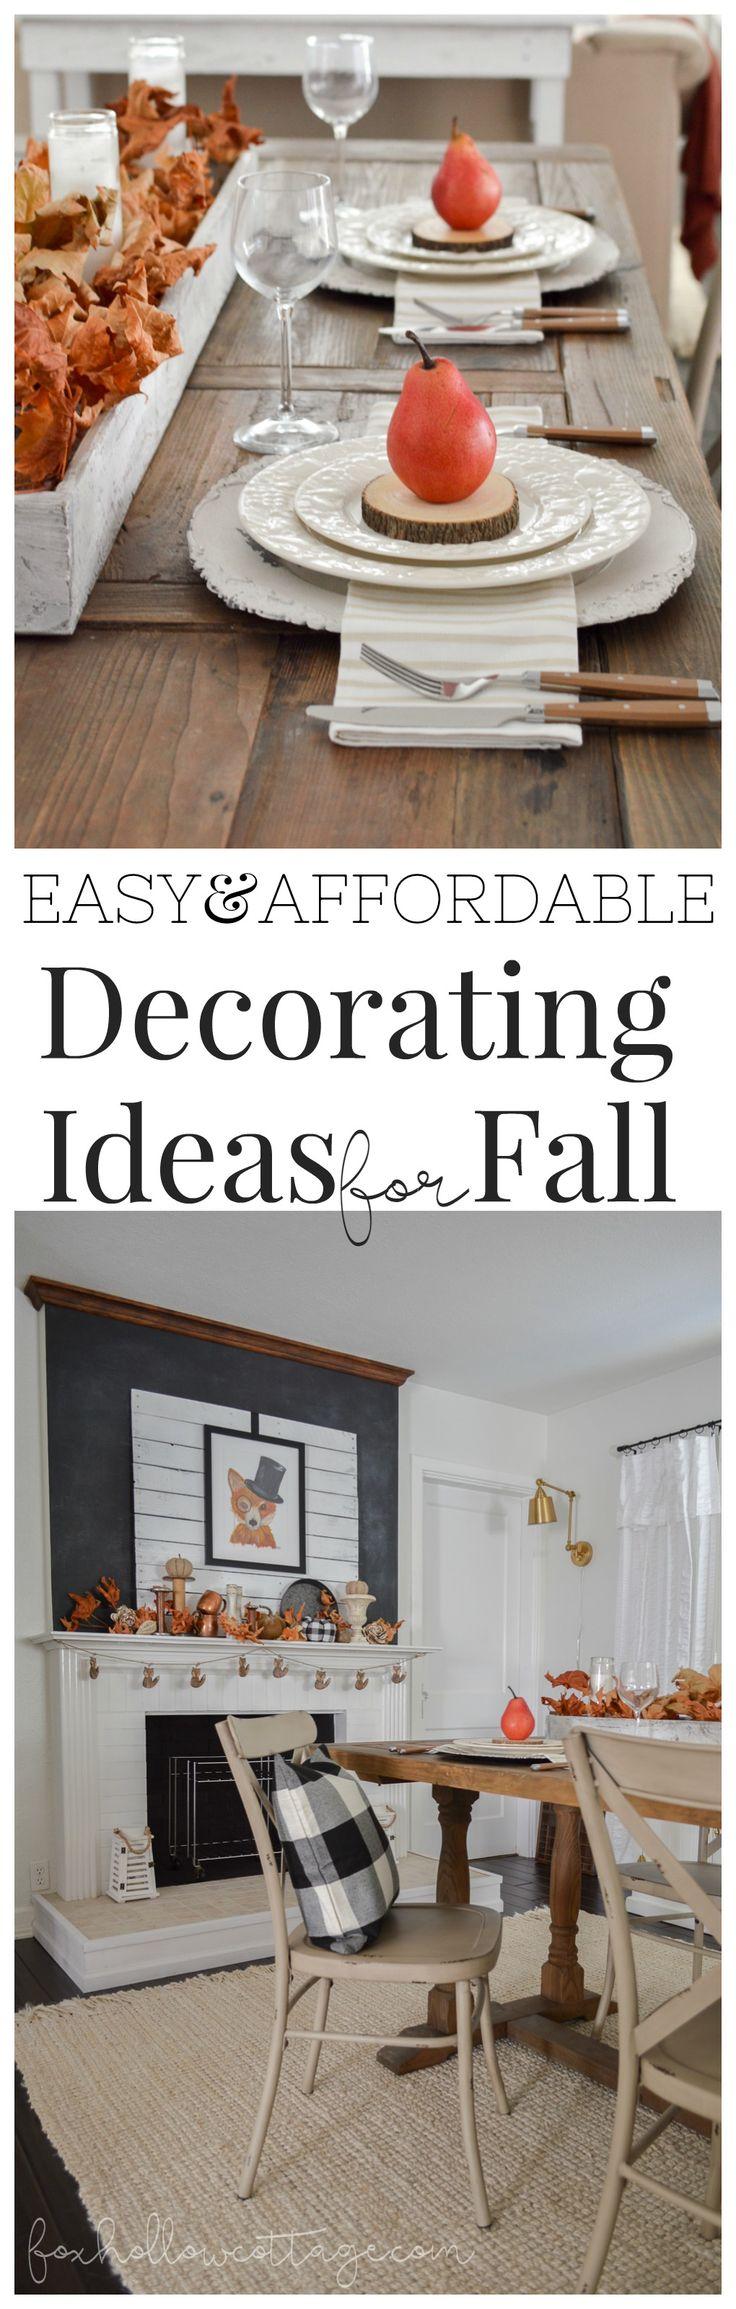 579 best Fall \u0026 Autumn: Diy crafts, decor and recipe ideas images ...